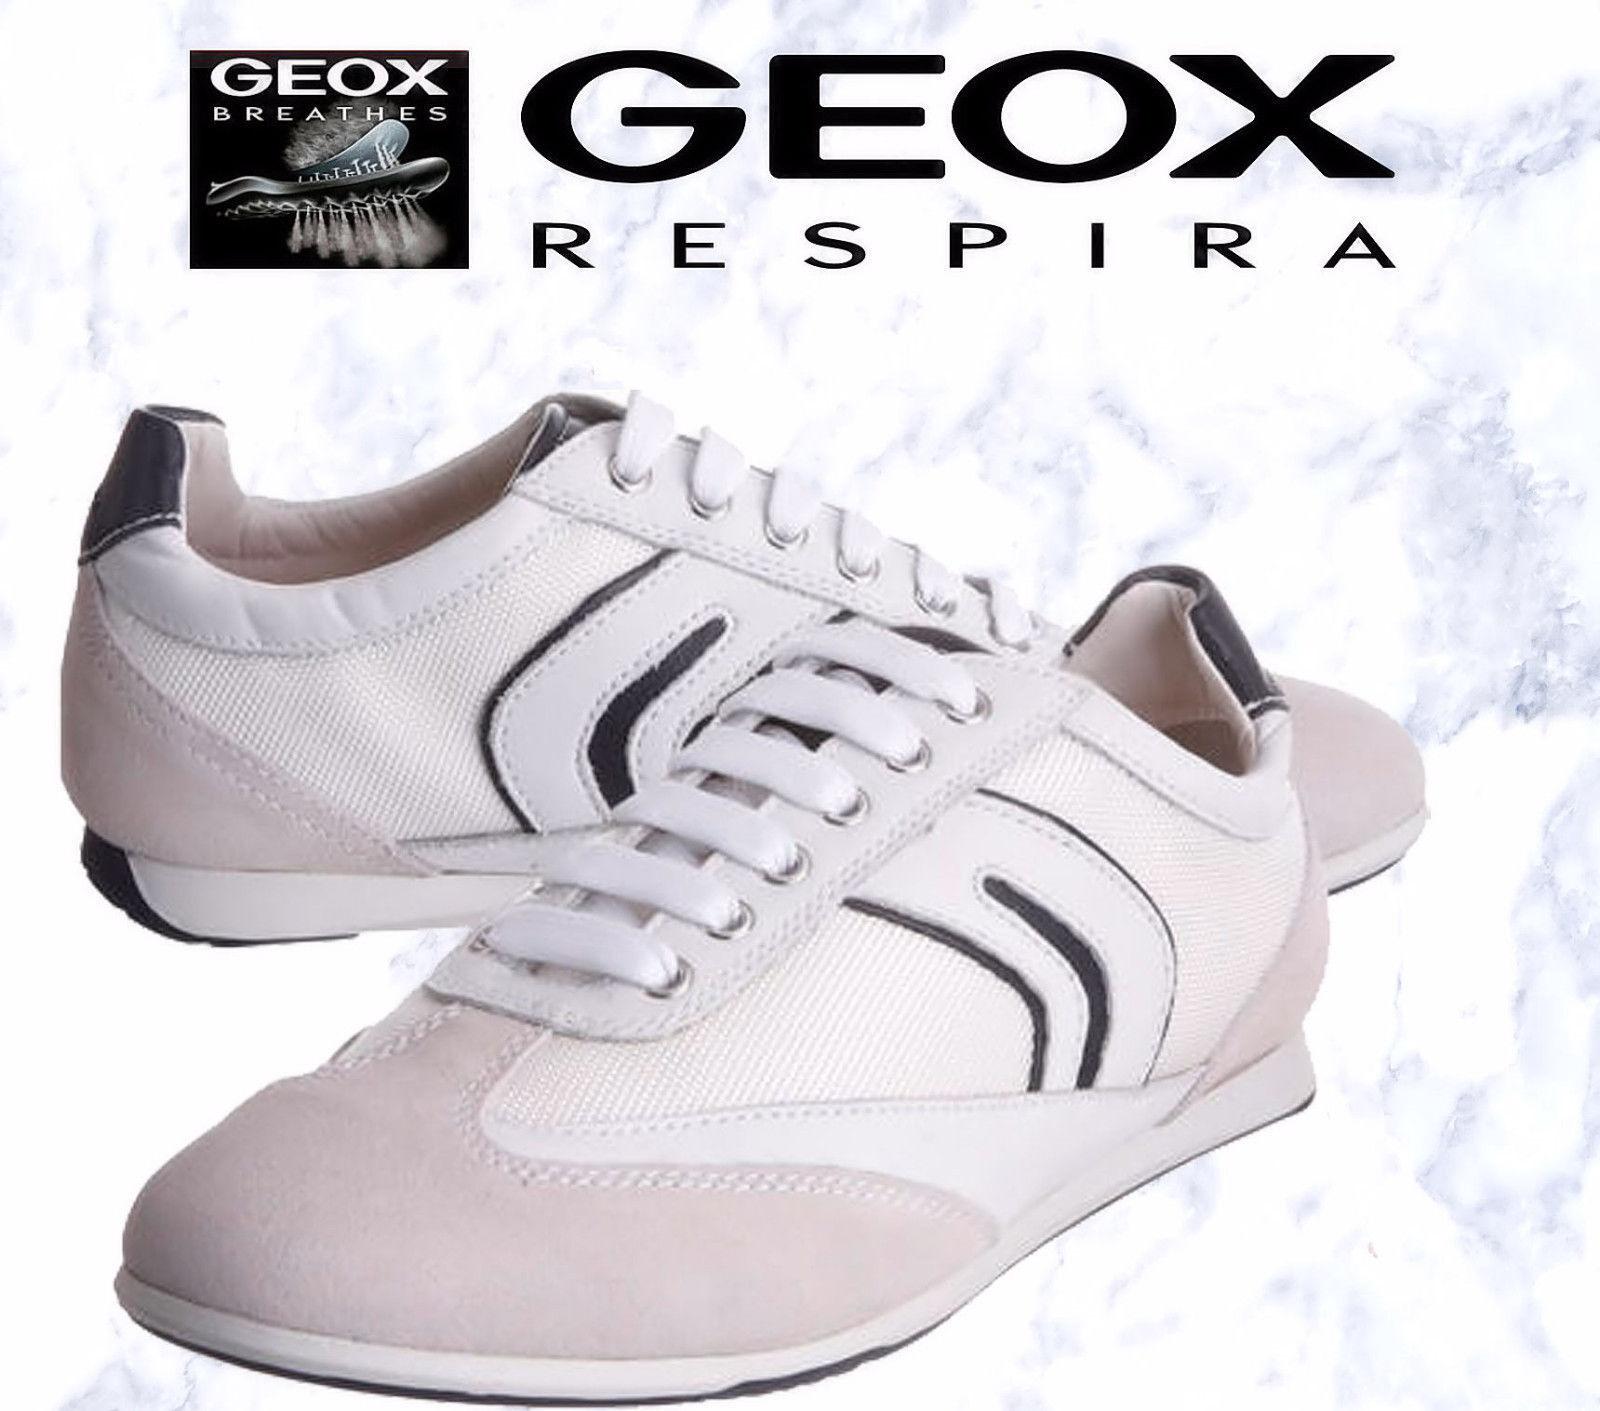 LIMITED Geox White Trainers Size 10 UK Men's U Andrea Respira NIB P&P Secure